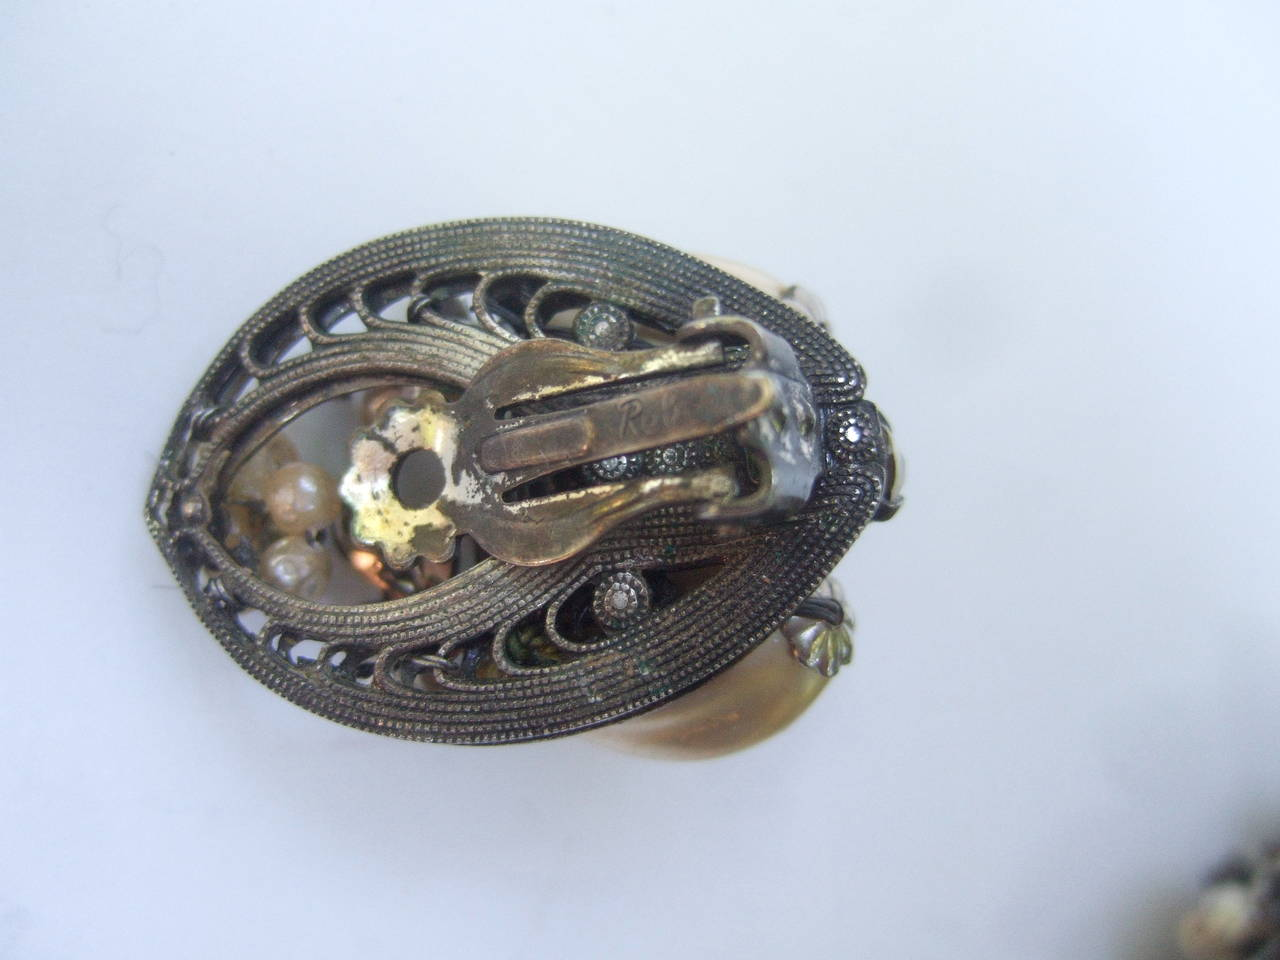 1950s Costume Pearl Brooch, Bracelet & Earrings by Robert For Sale 5